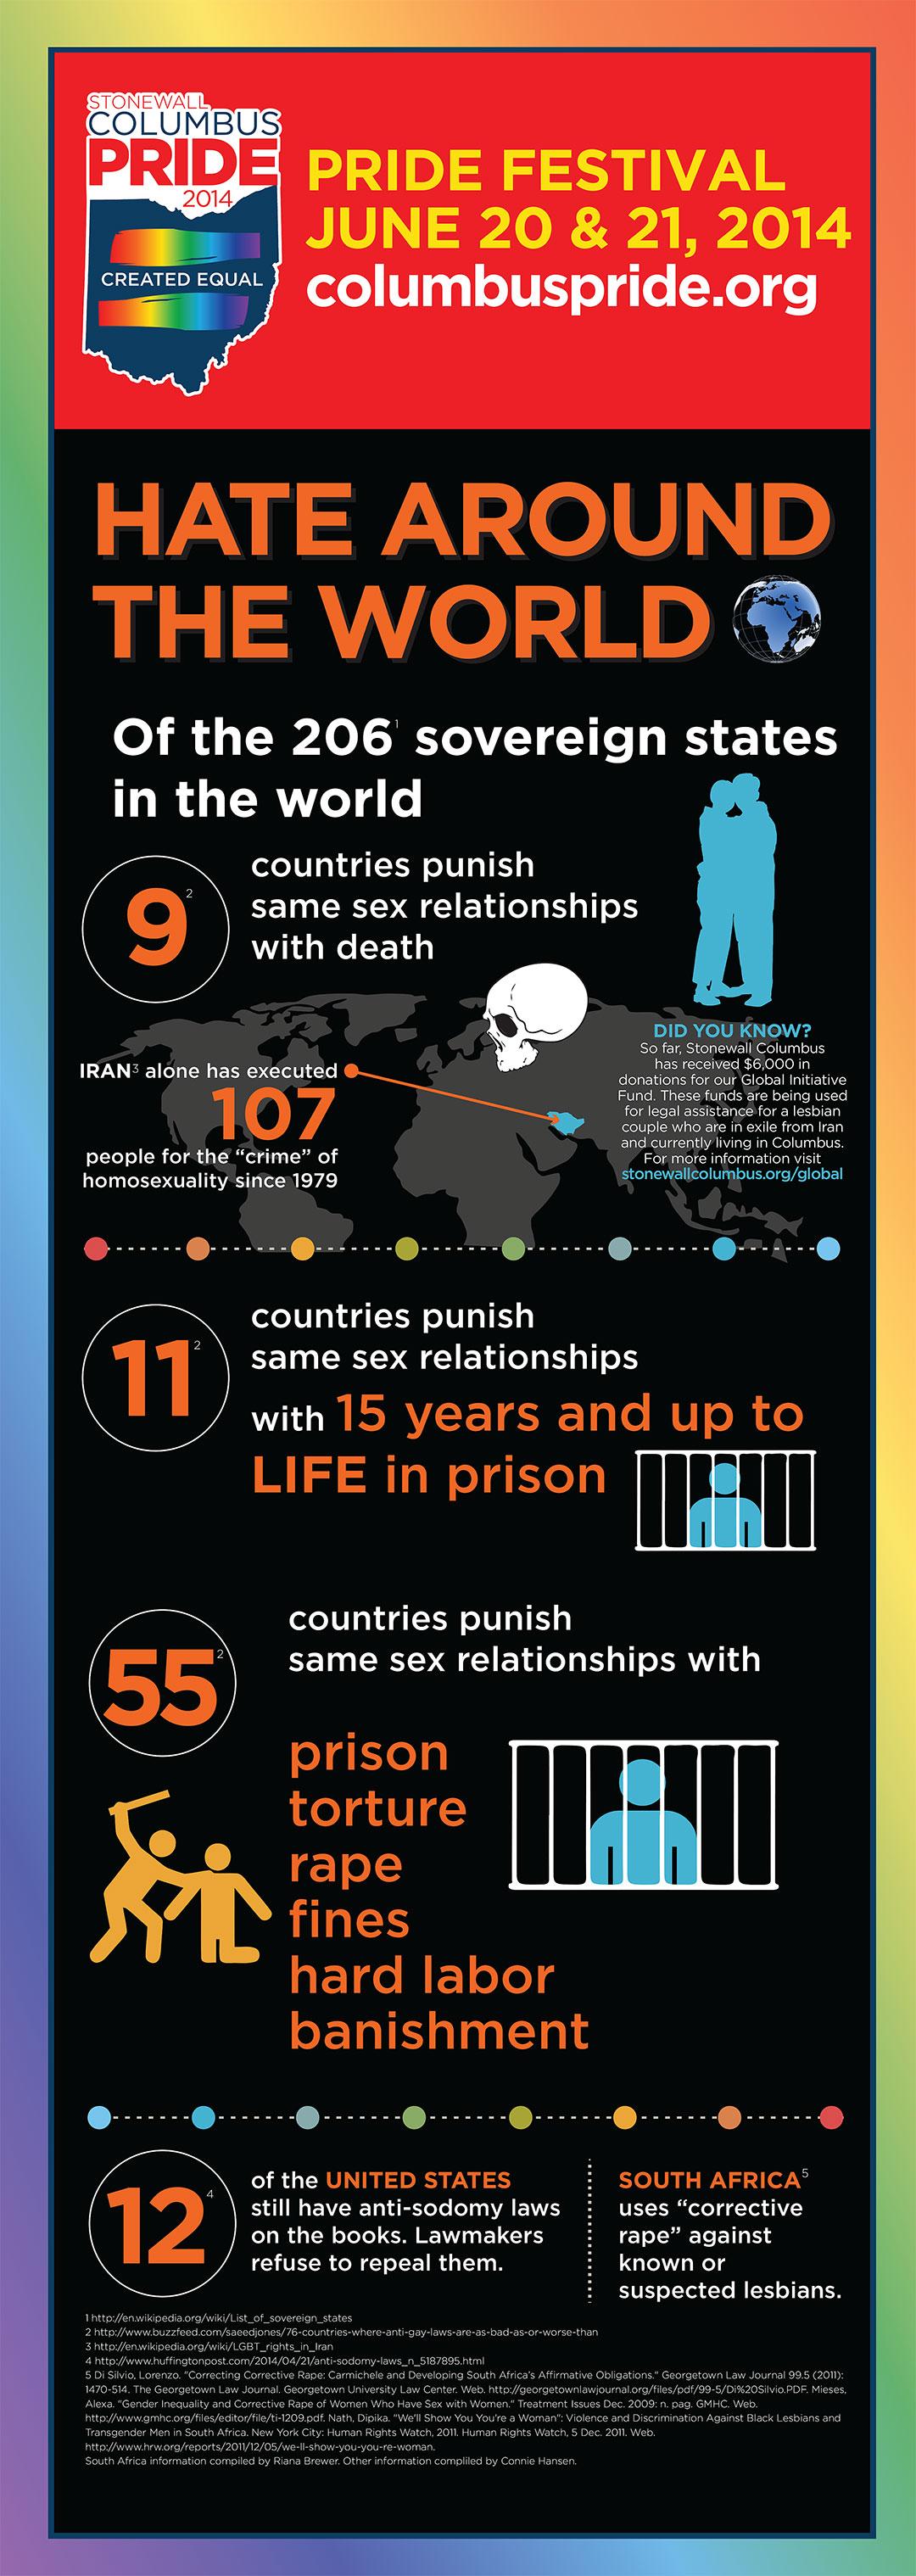 Stonewall Columbus Pride 2014: Hate around the world Infographic